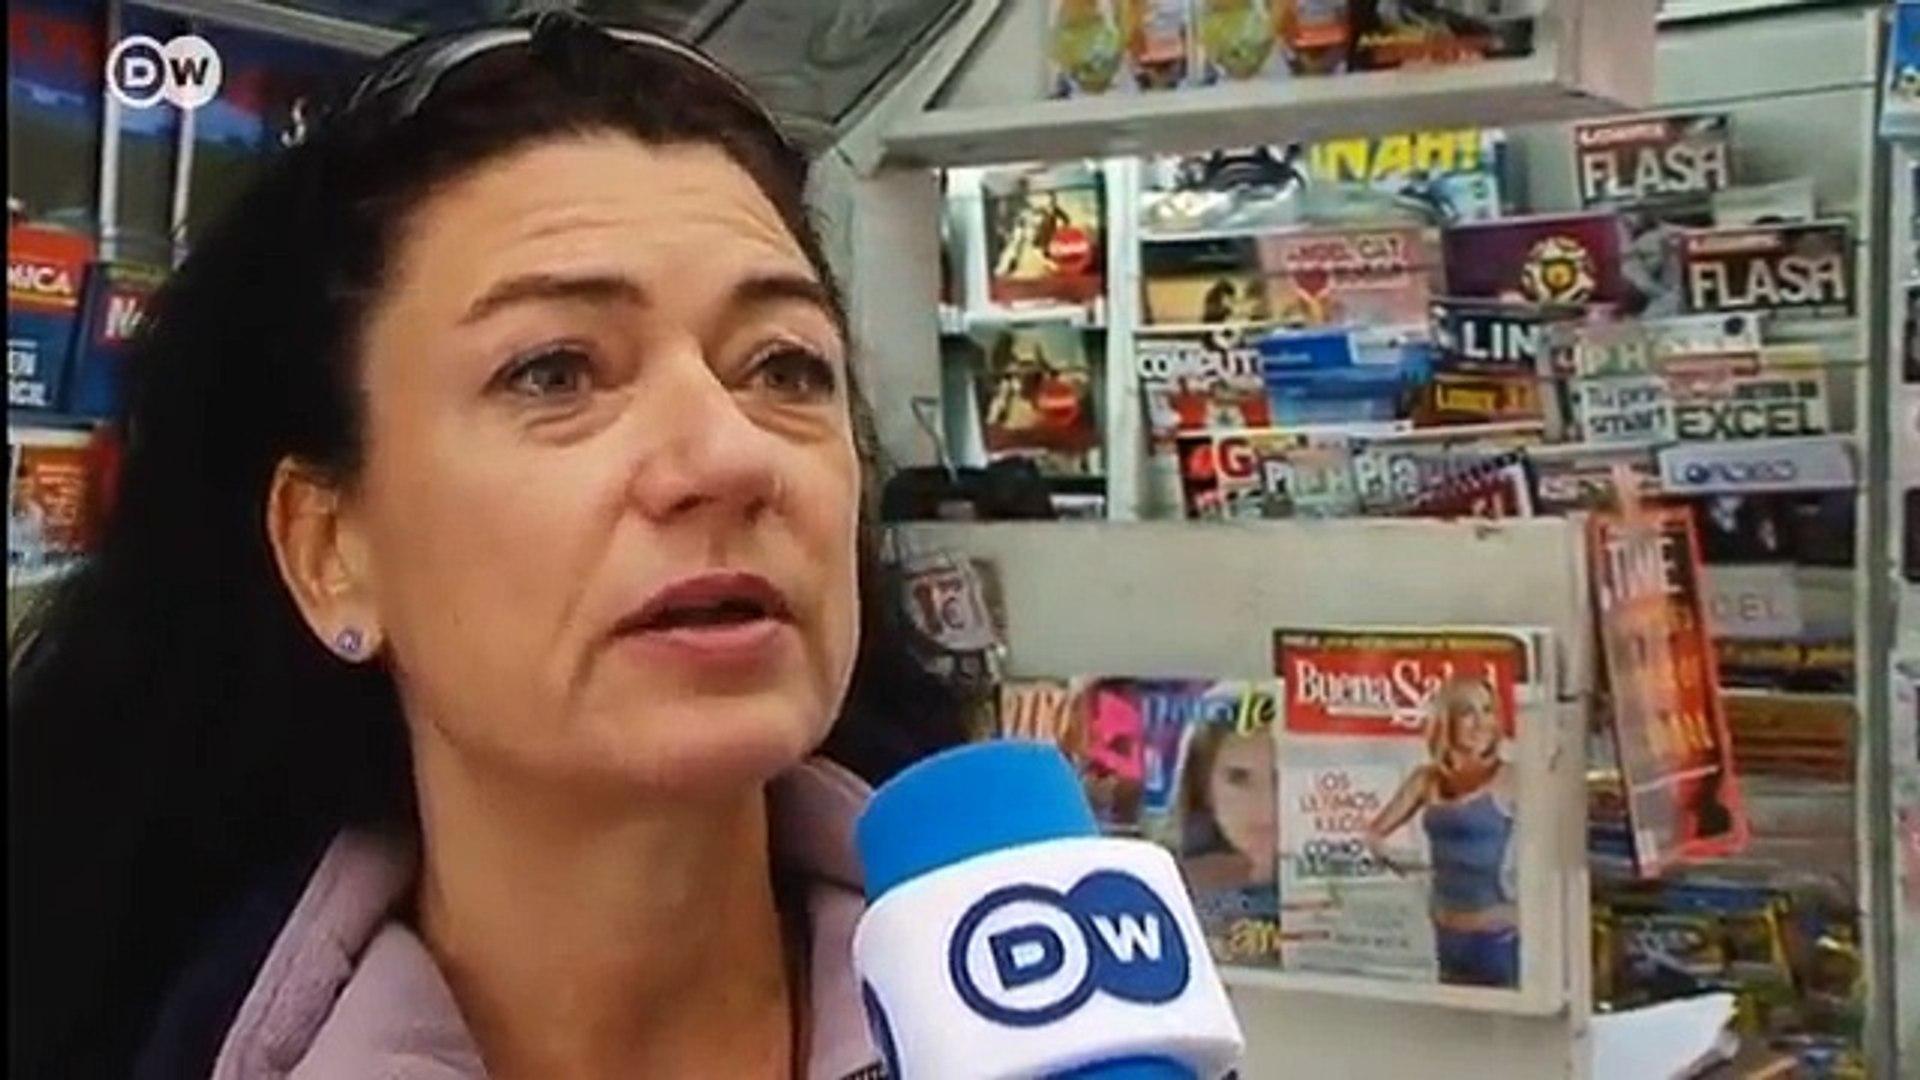 Liberated News - The Argentinische Tageblatt   People & Politics